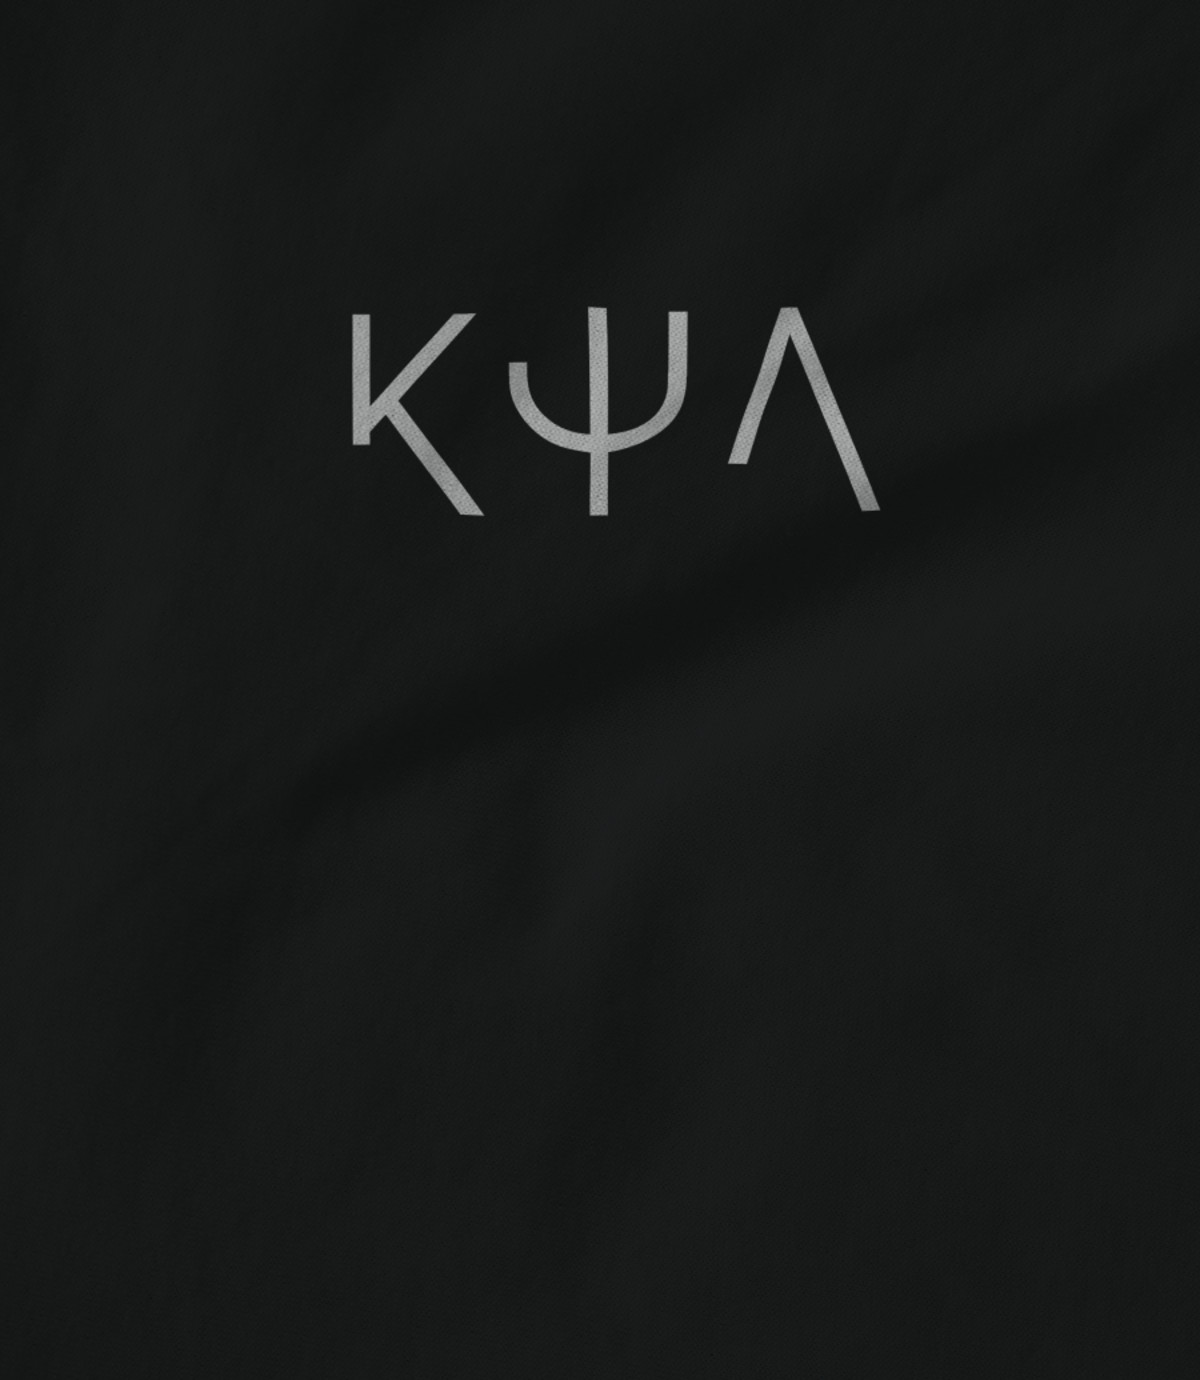 Keep shelly in athens black kfmnvz